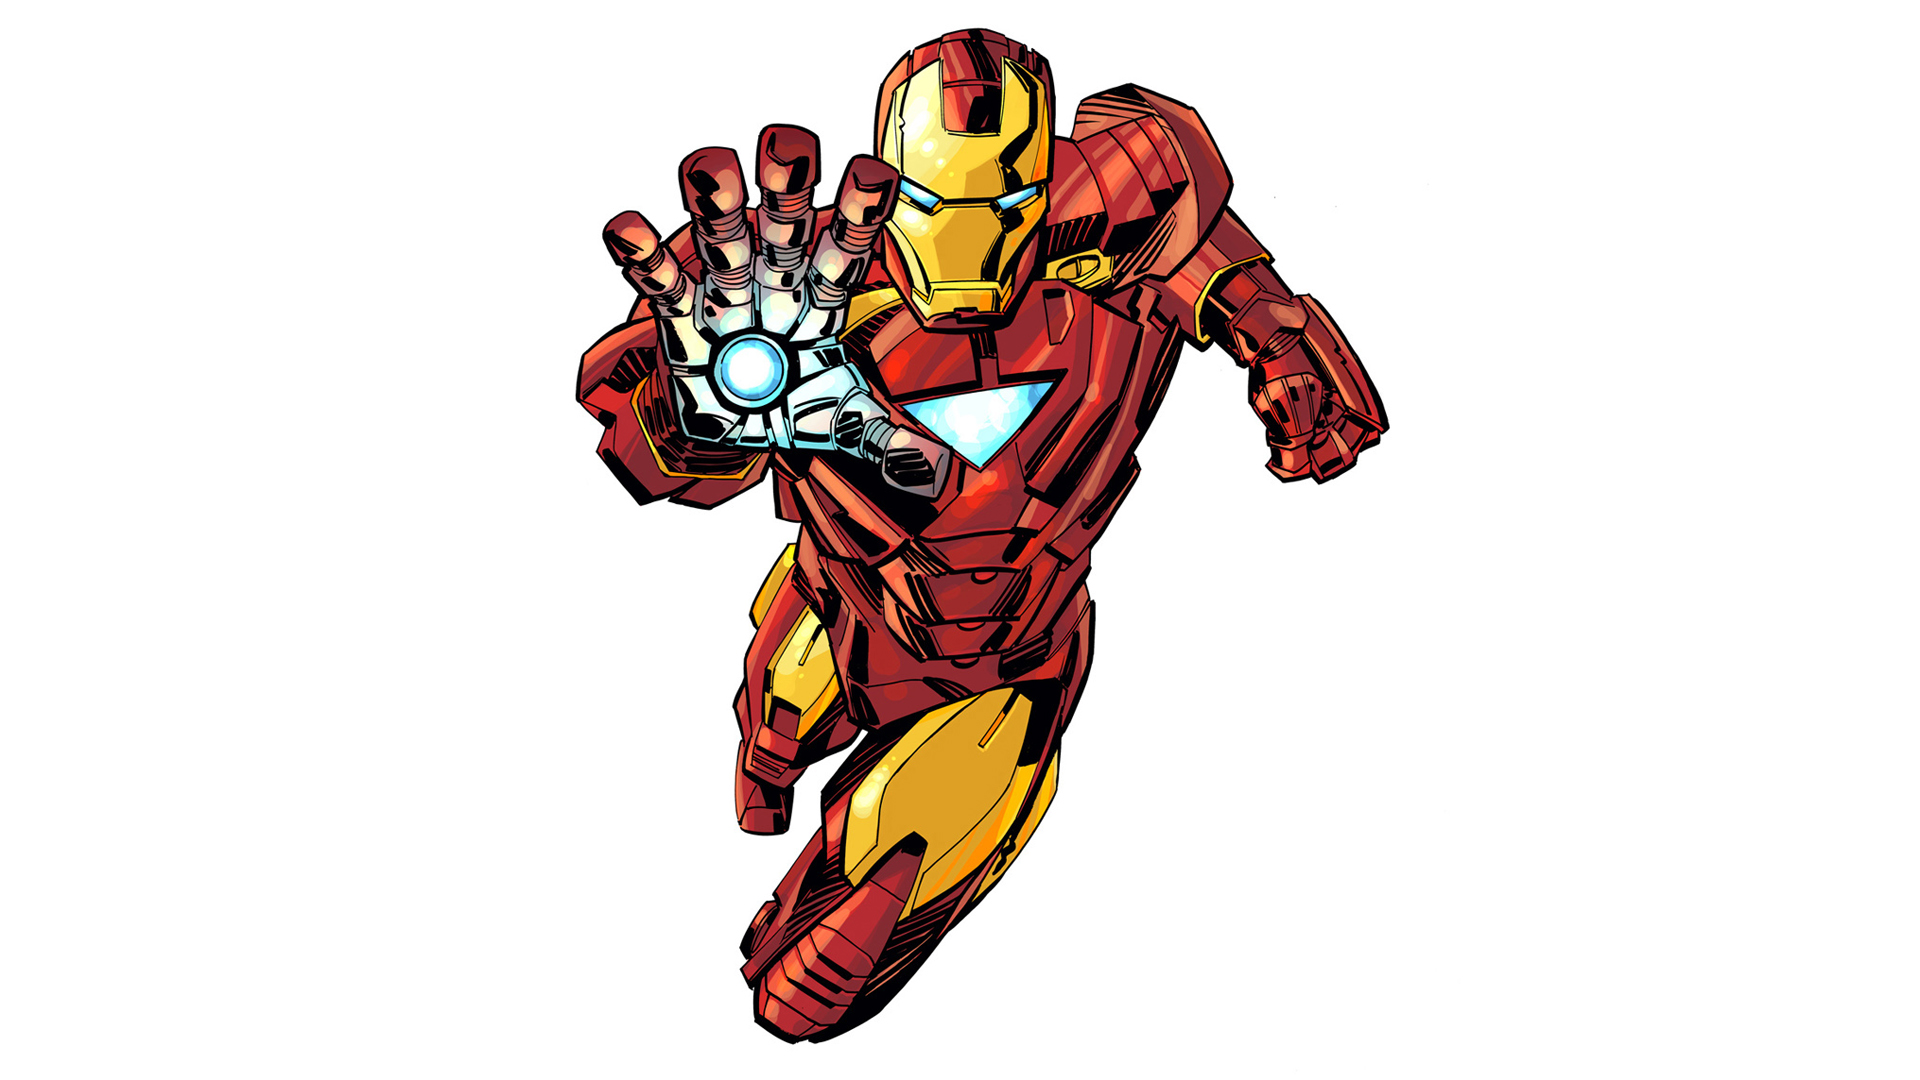 Iron Man Comic Wallpapers Free - Wickedsa com